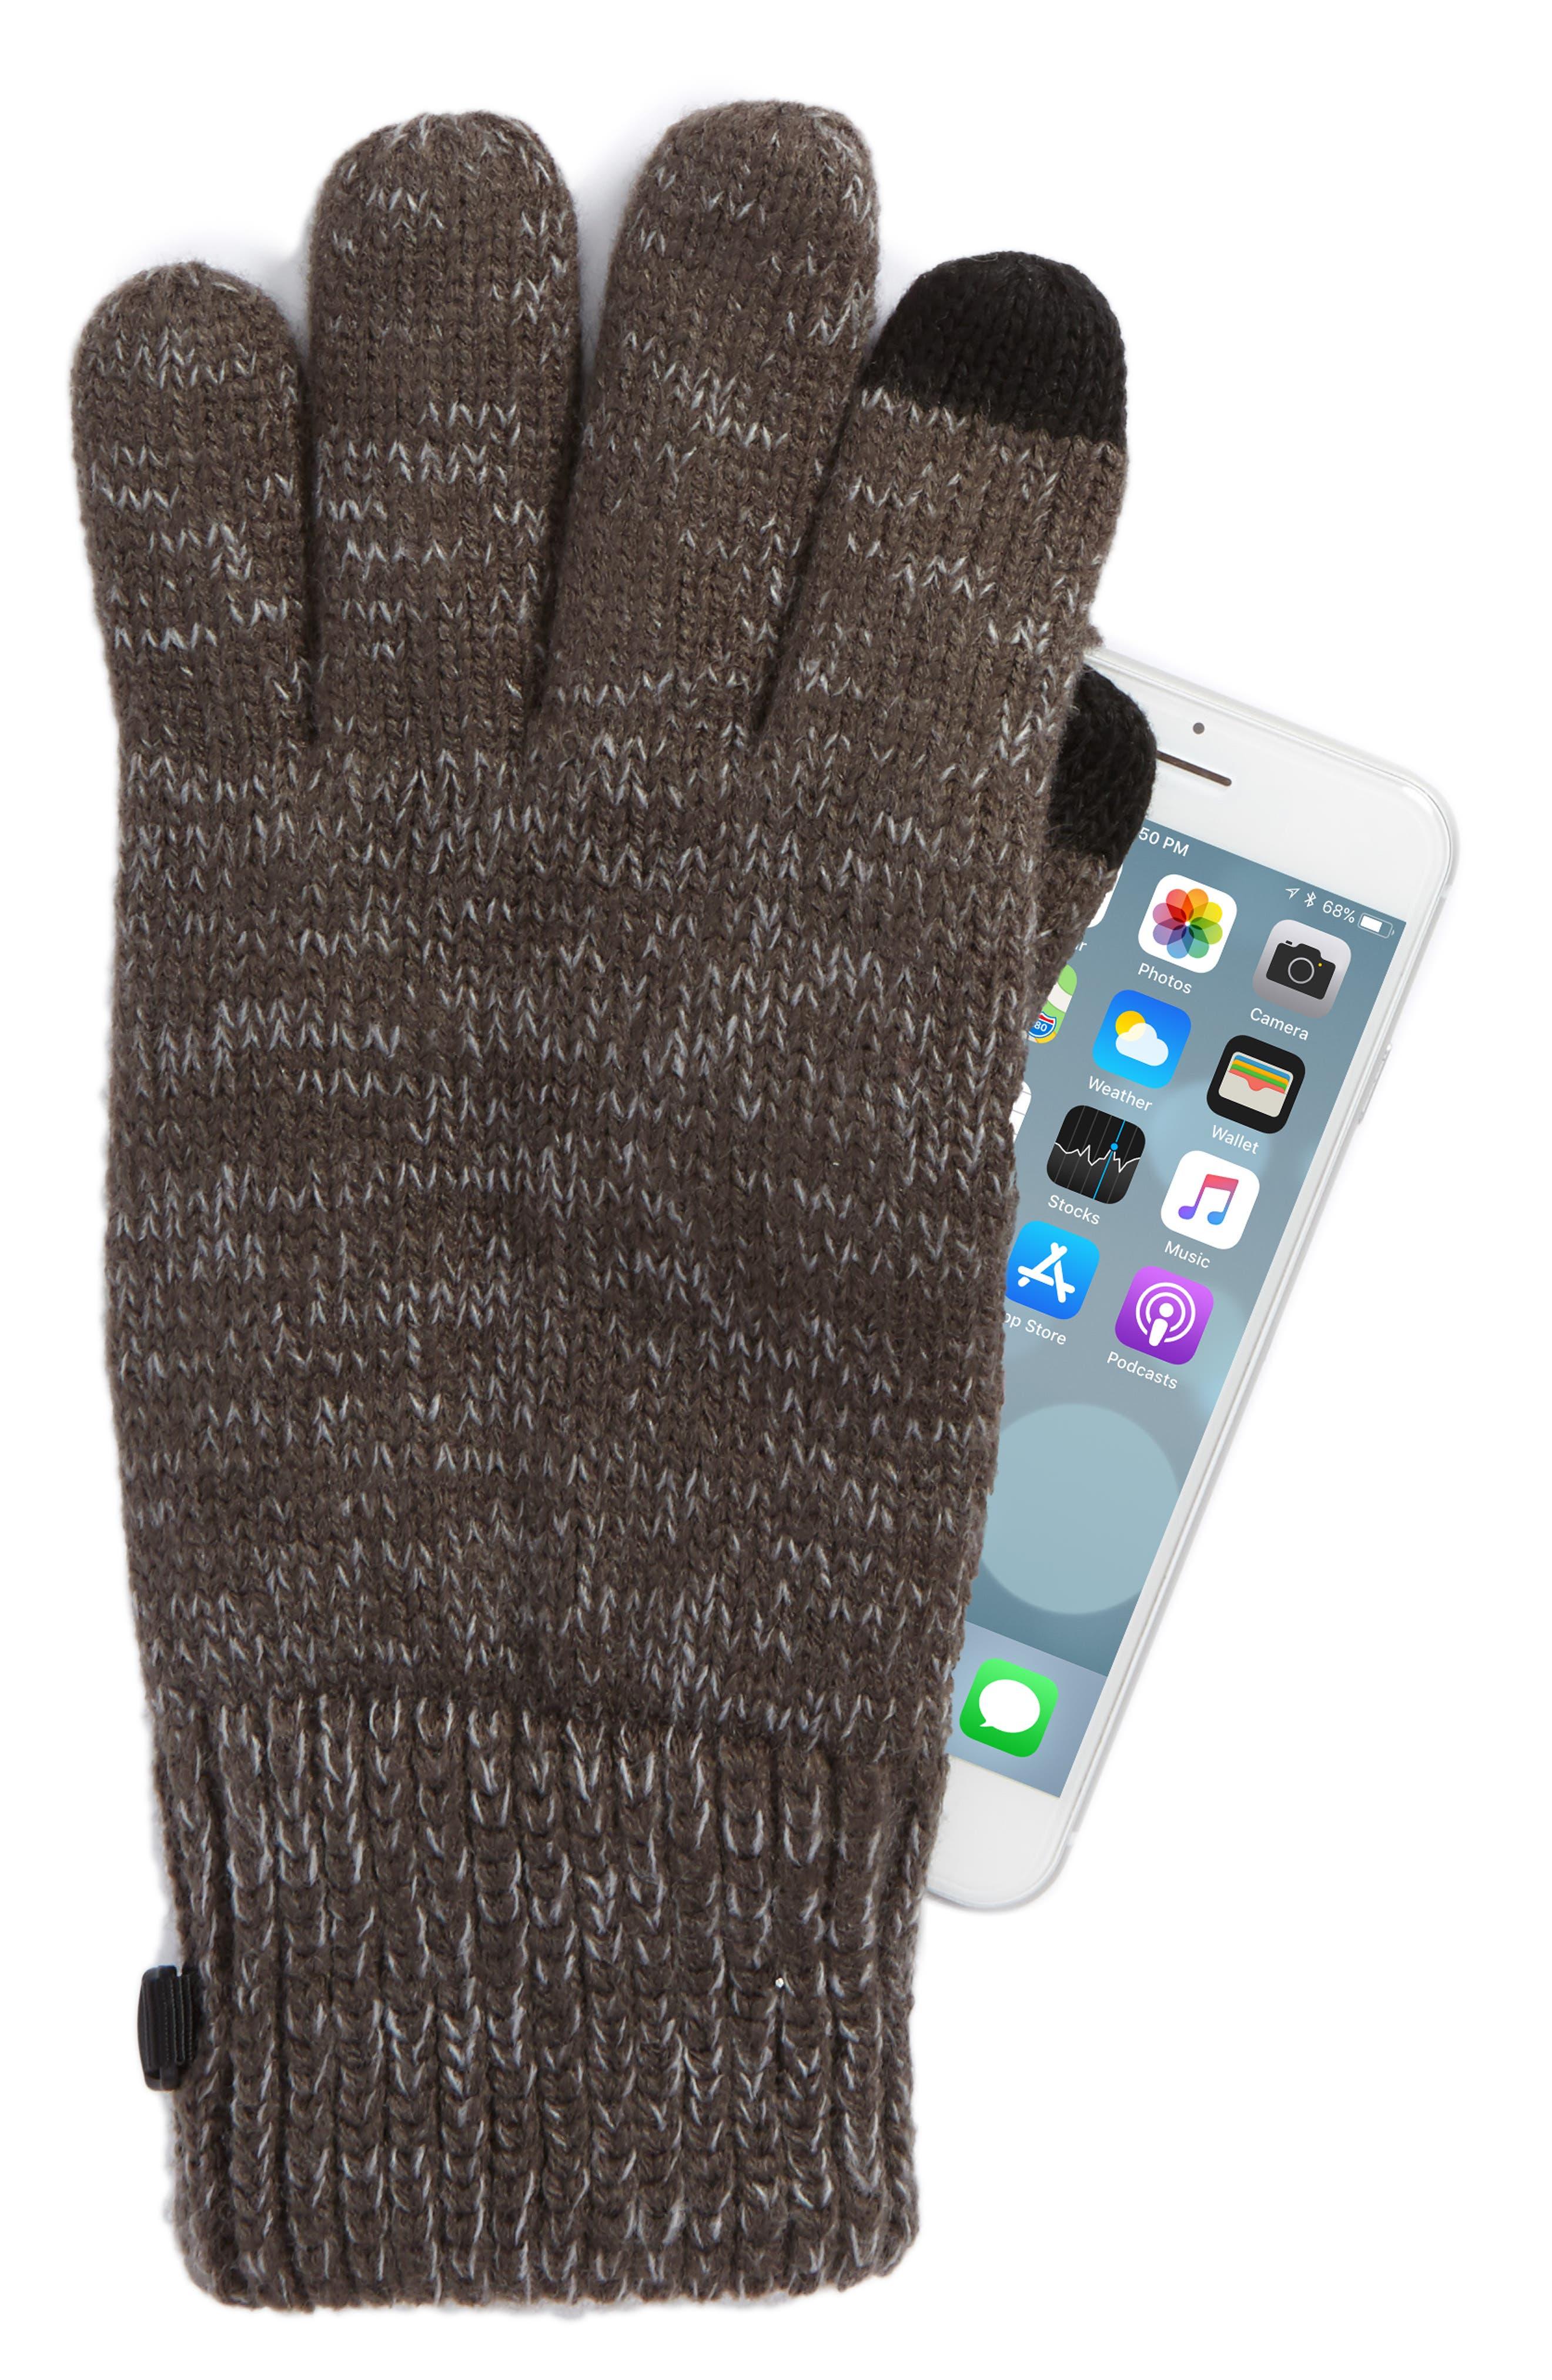 Etip Salty Dog Knit Tech Gloves,                             Alternate thumbnail 2, color,                             GRAPHITE GREY/ MID GREY MARL